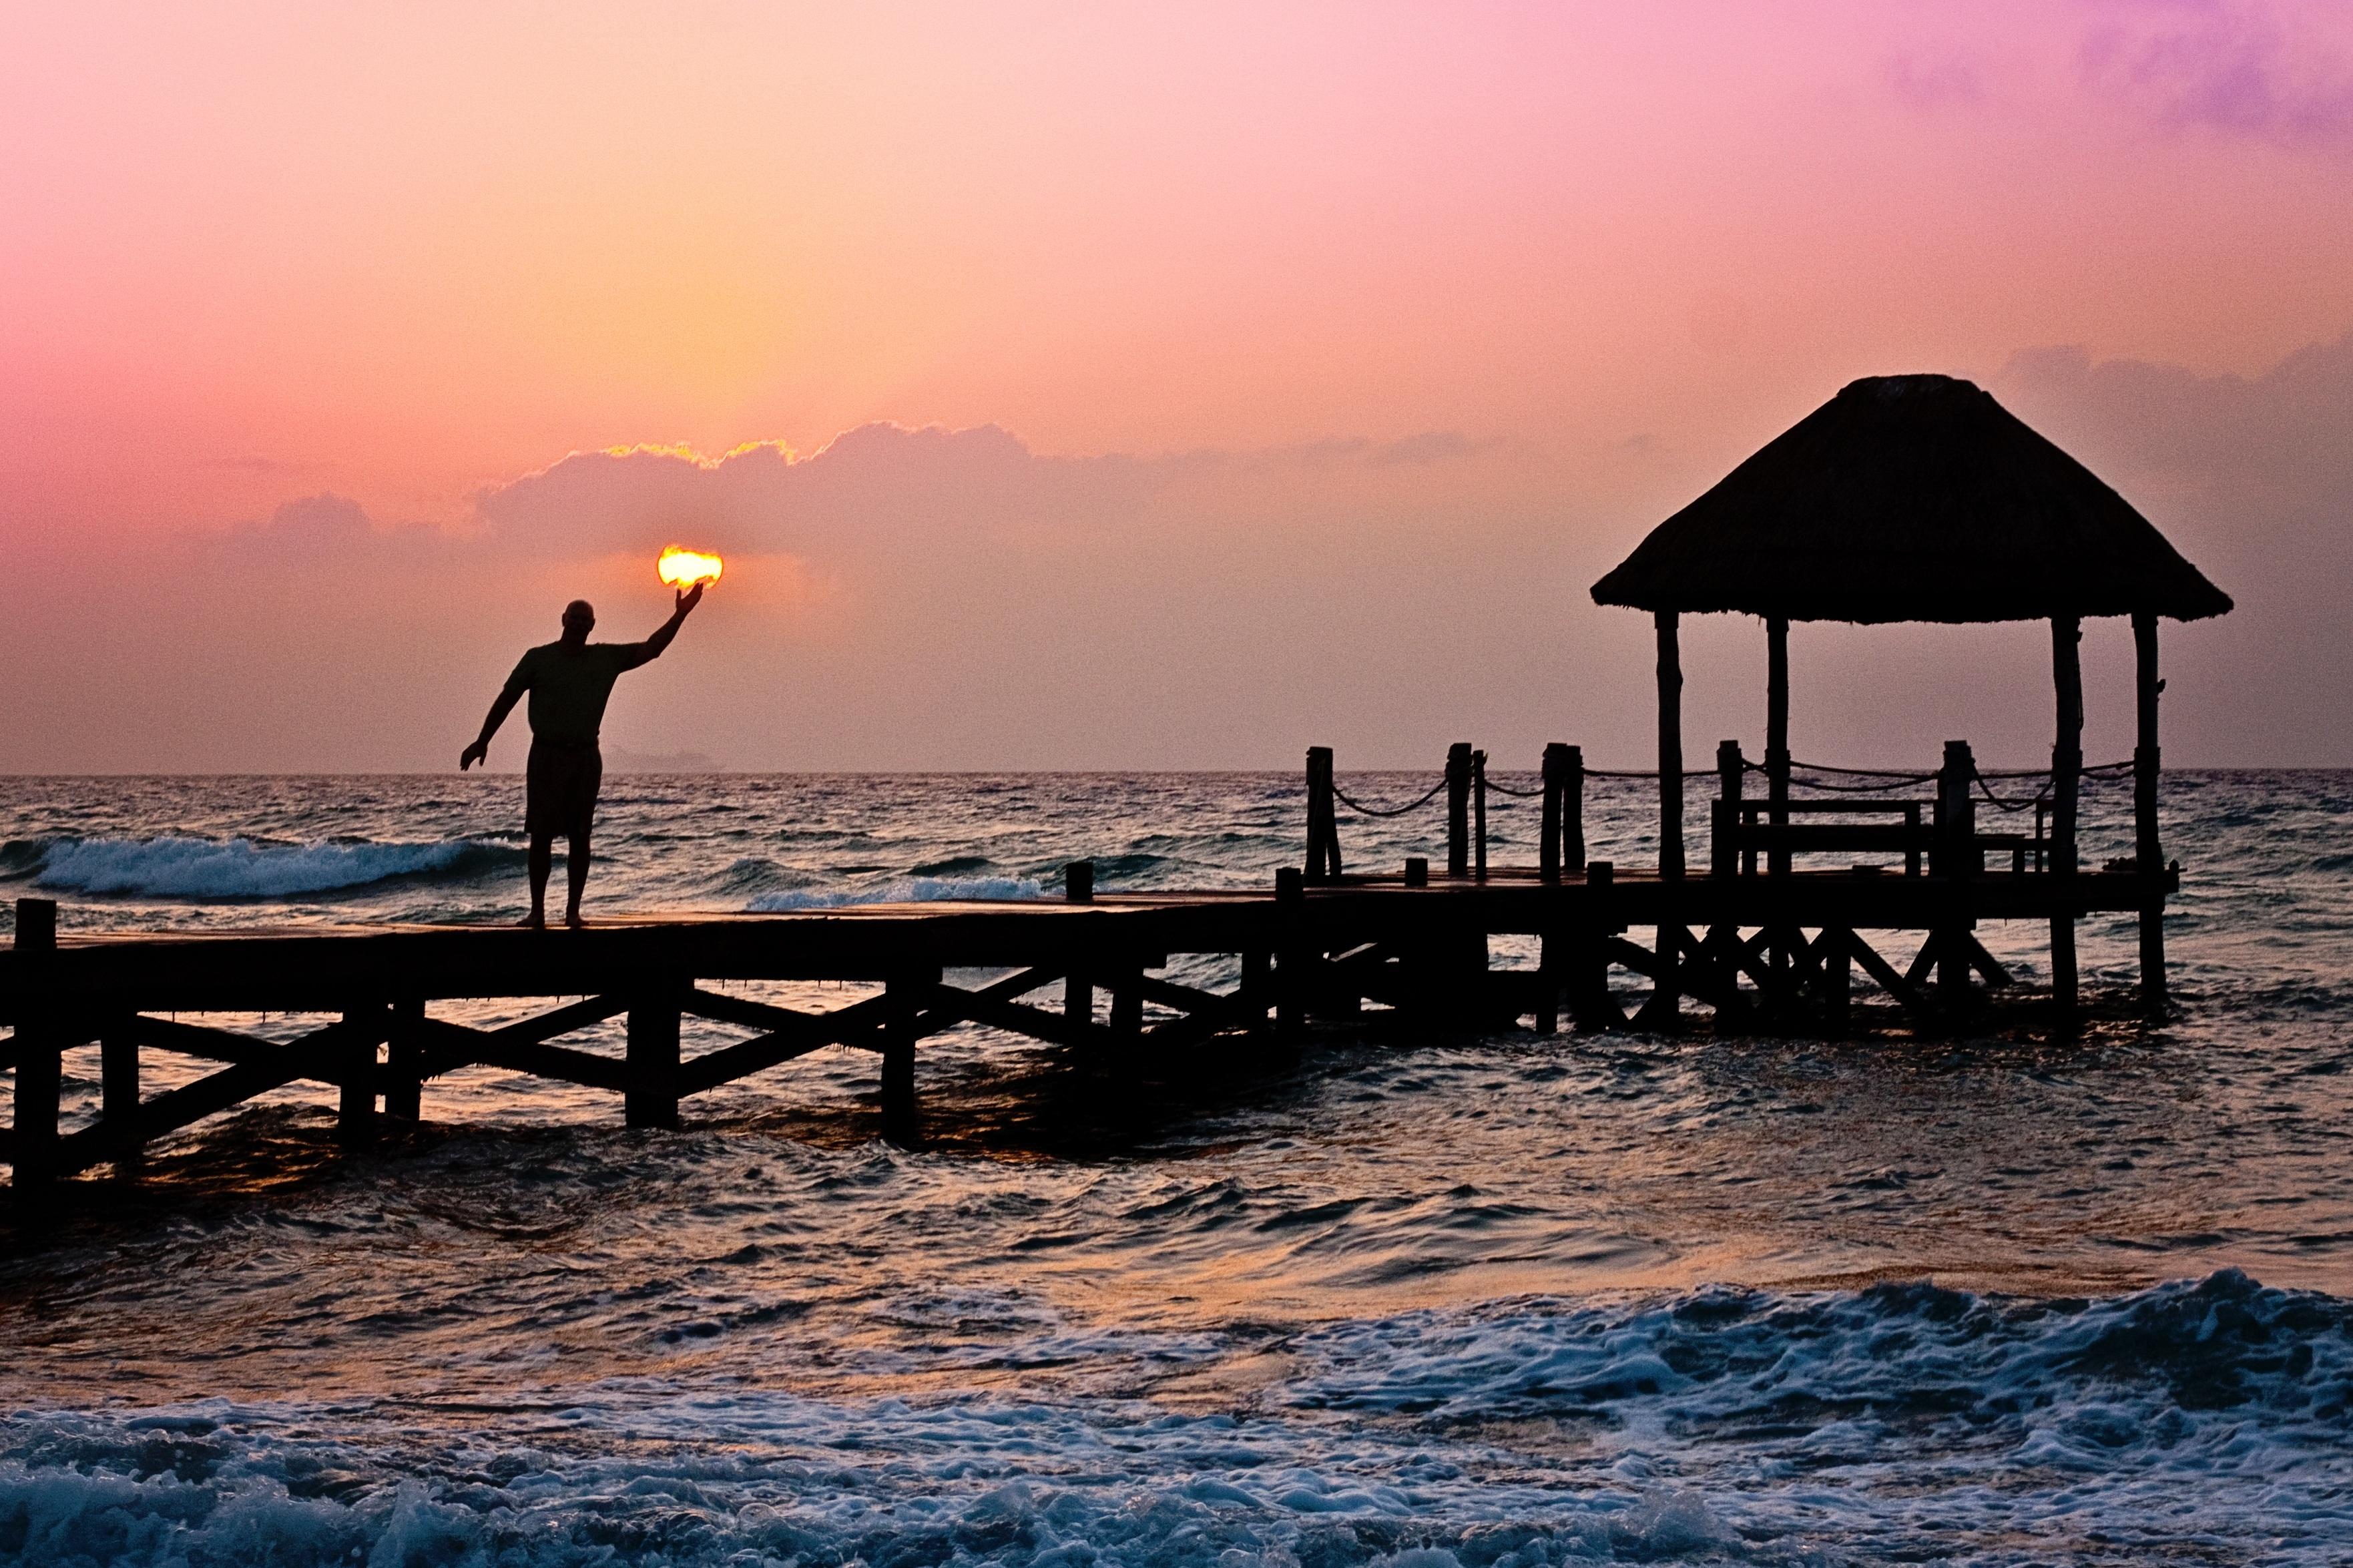 Man on the Dock, Activity, Beach, Construction, Dock, HQ Photo